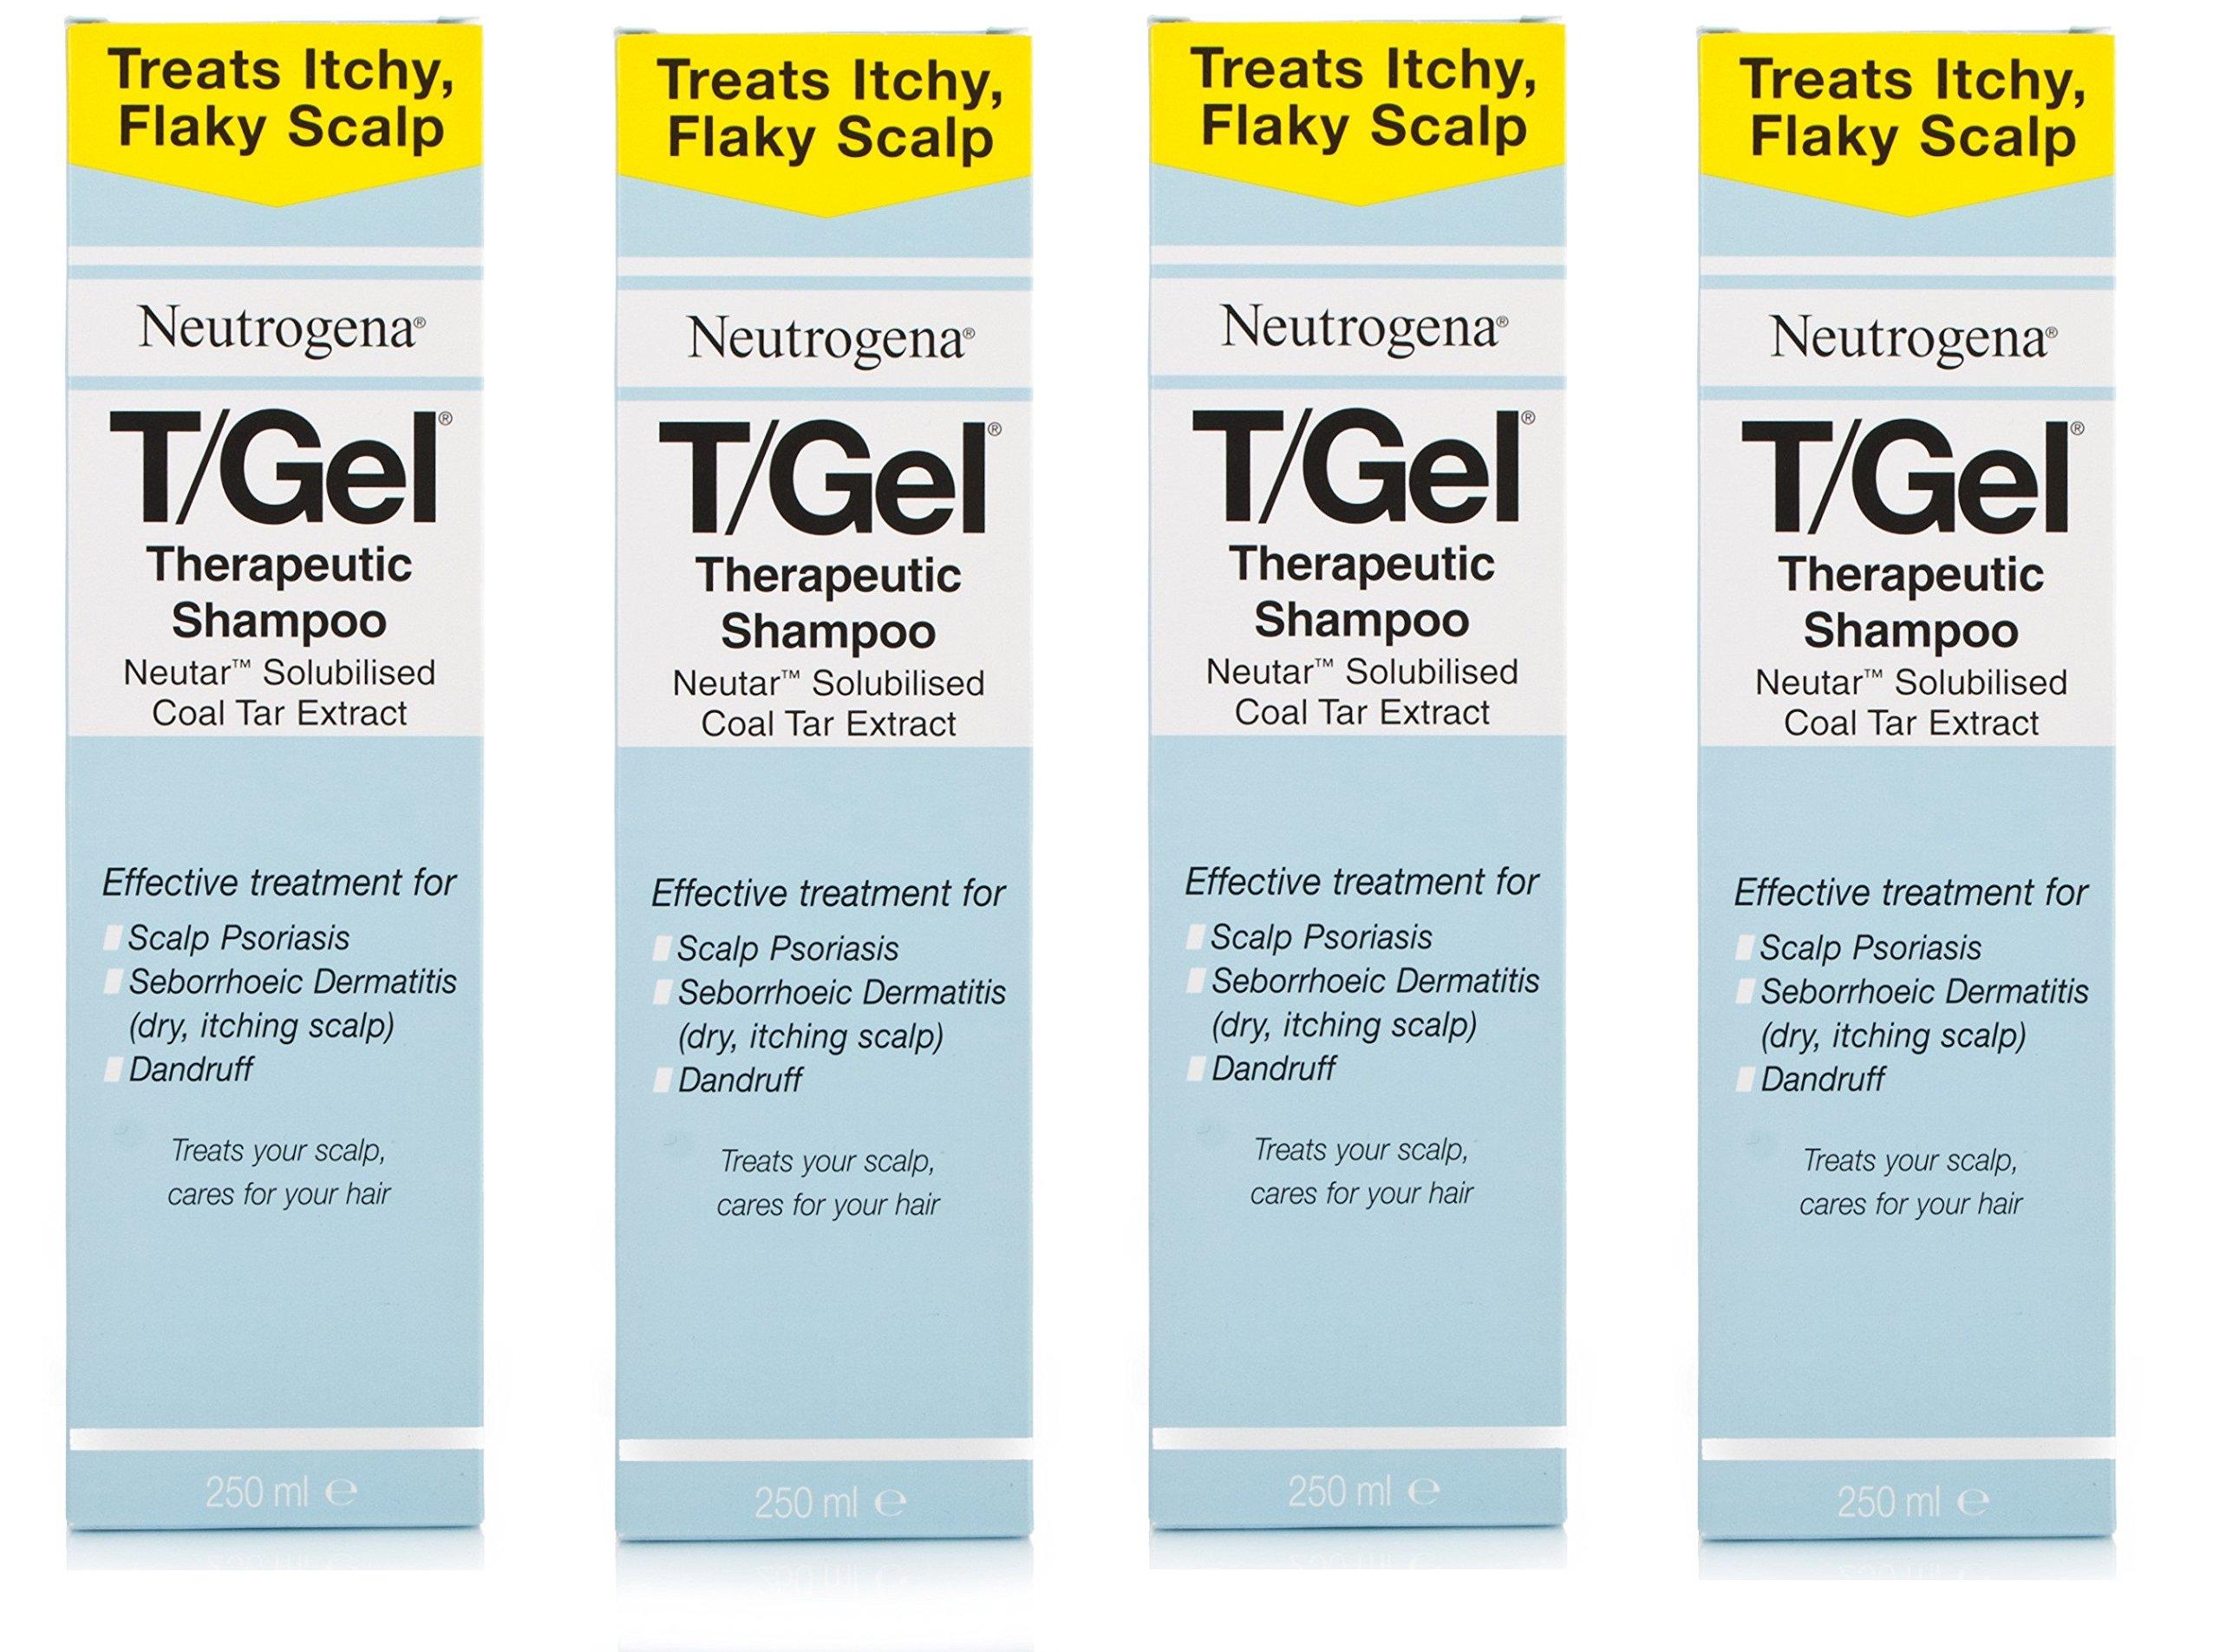 4 x 250mL Neutrogena T/Gel Therapeutic Shampoo TREATS ITCH FLAKY SCALP